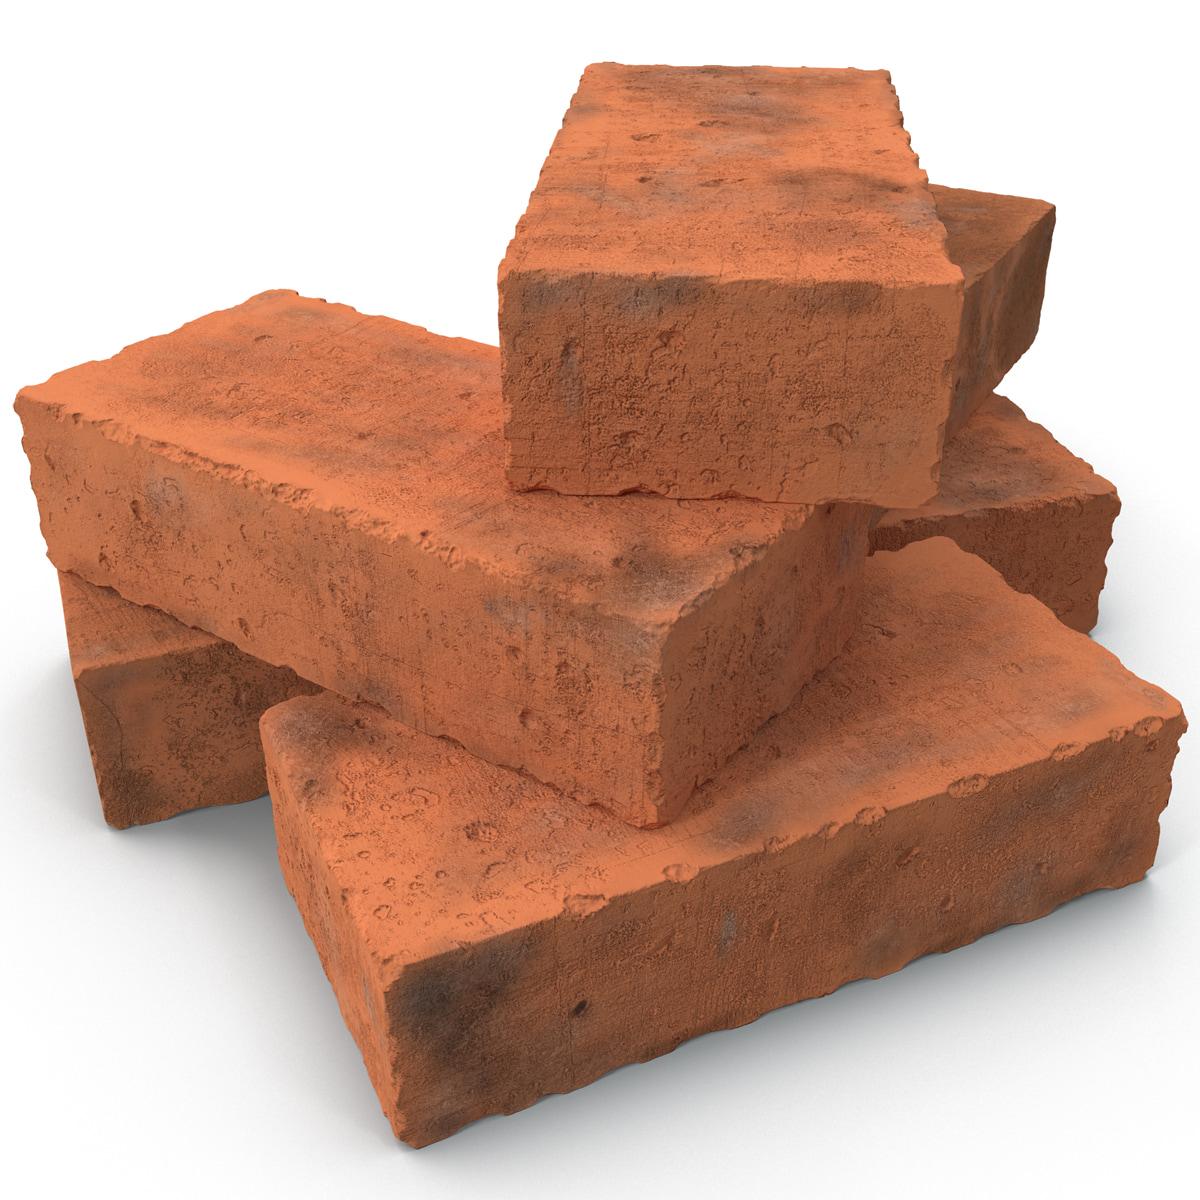 3ds bricks materials